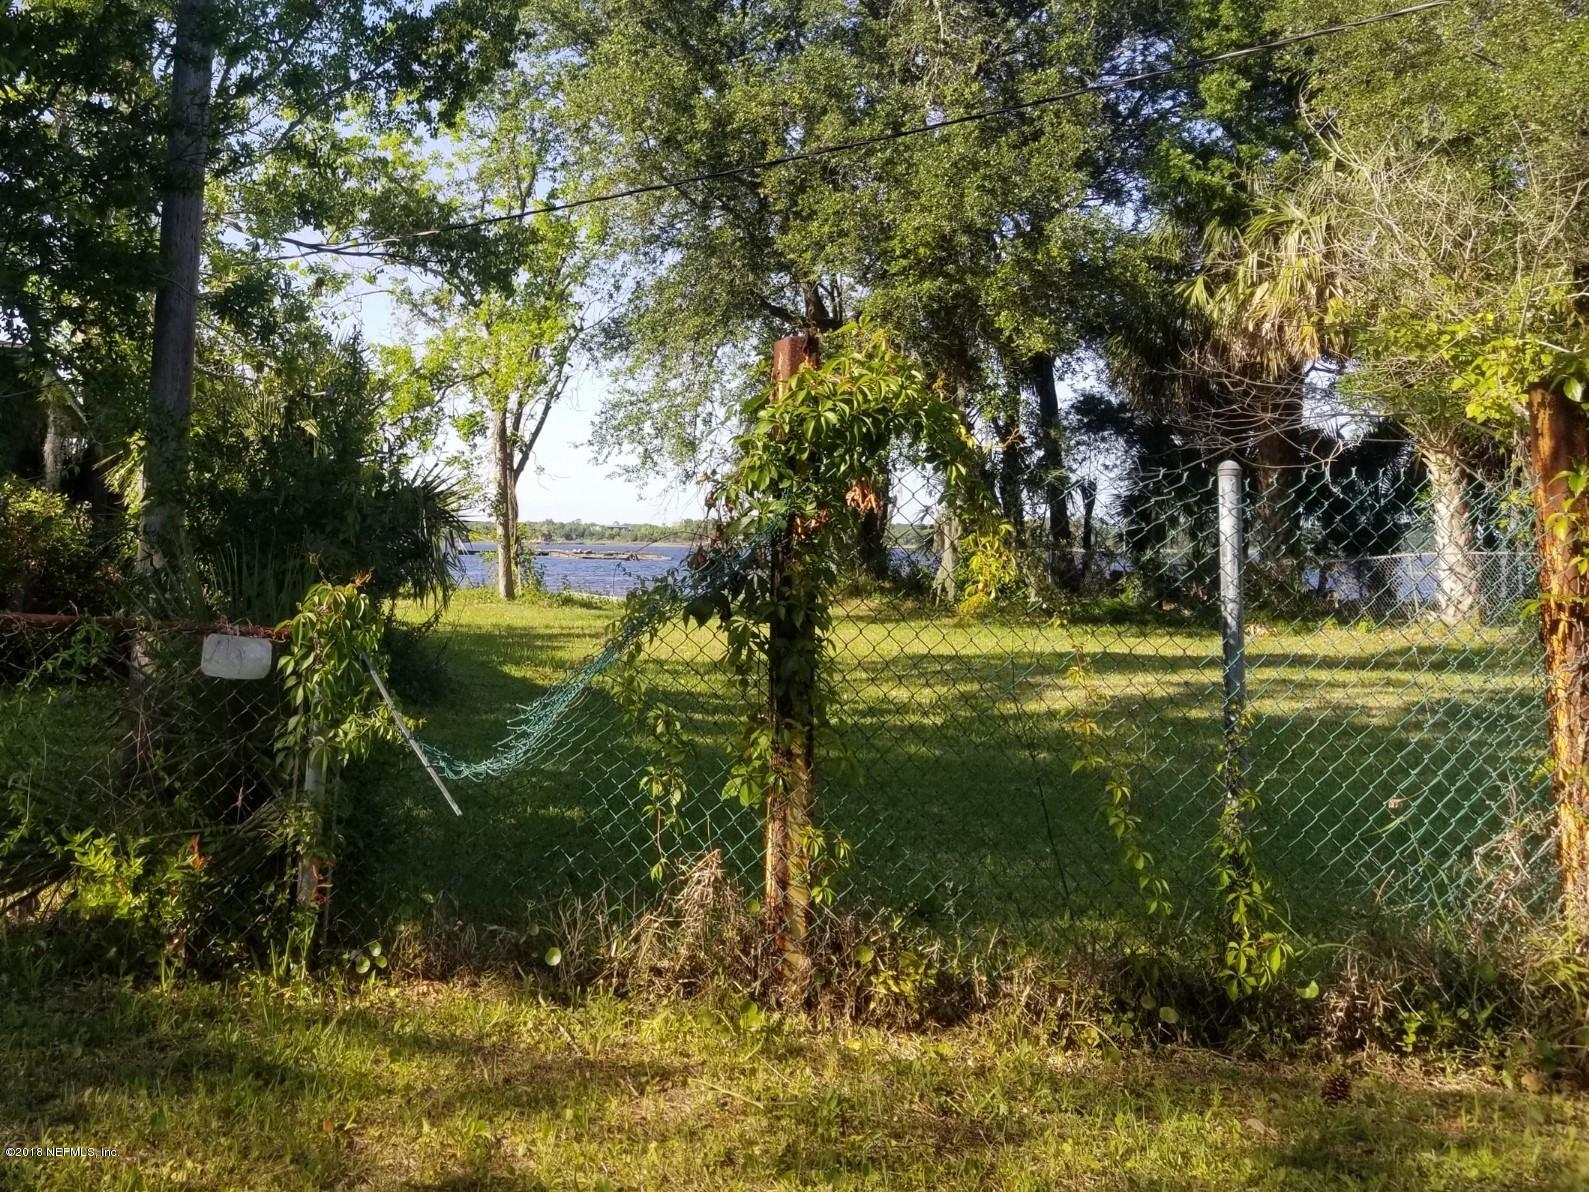 0 KENILWORTH, JACKSONVILLE, FLORIDA 32208, ,Vacant land,For sale,KENILWORTH,960206